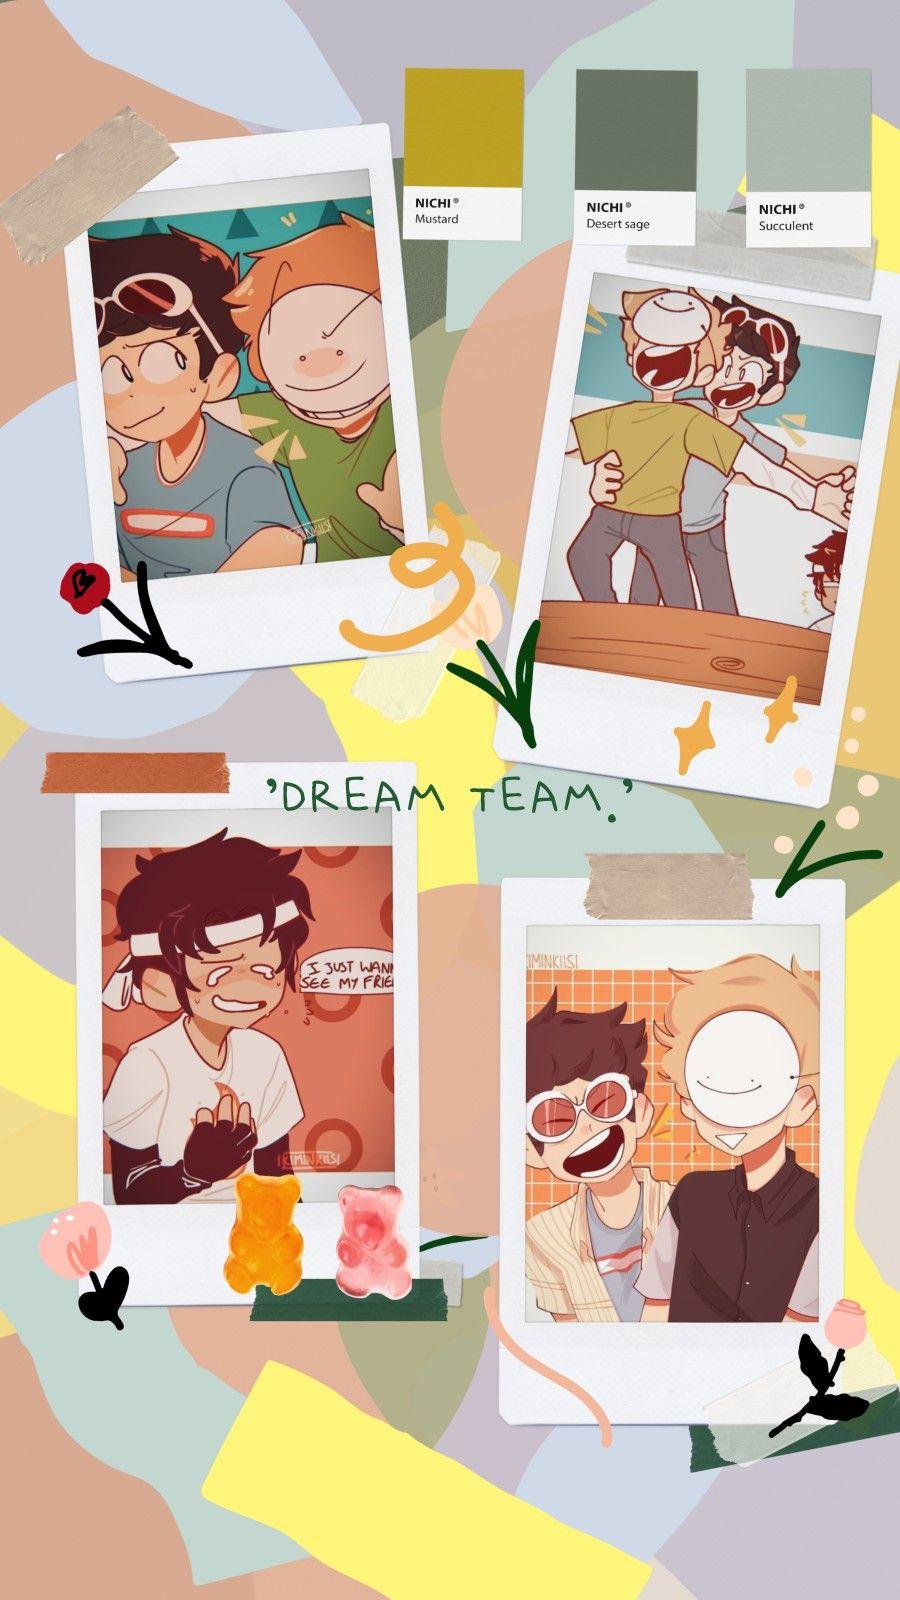 dream sapnap georgenotfound dream team wallpaper lockscreen in 900x1600